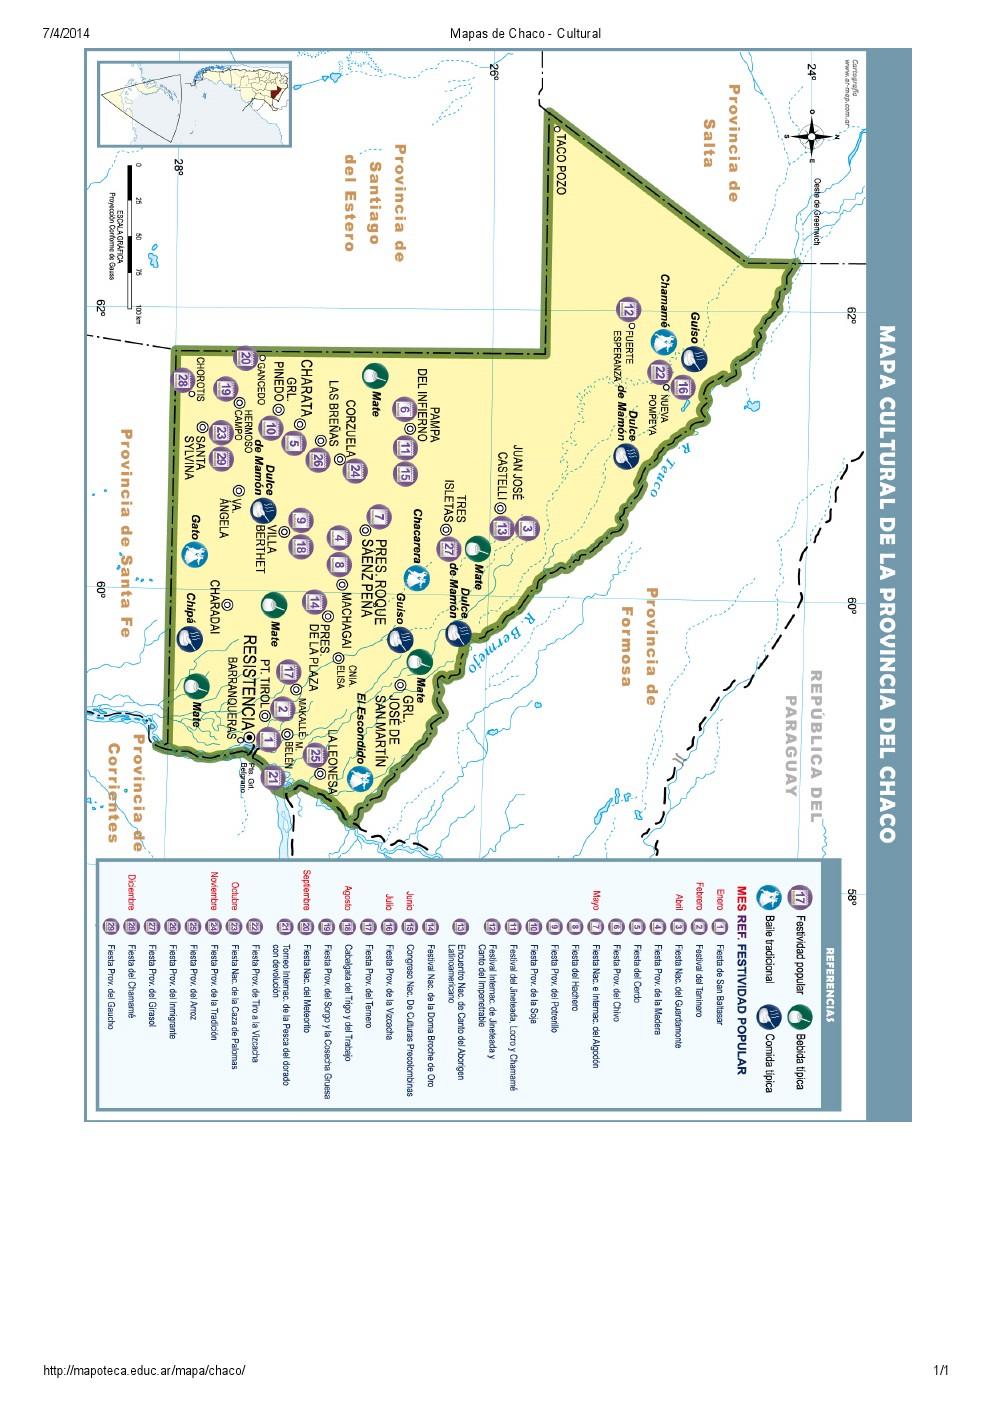 Mapa cultural del Chaco. Mapoteca de Educ.ar